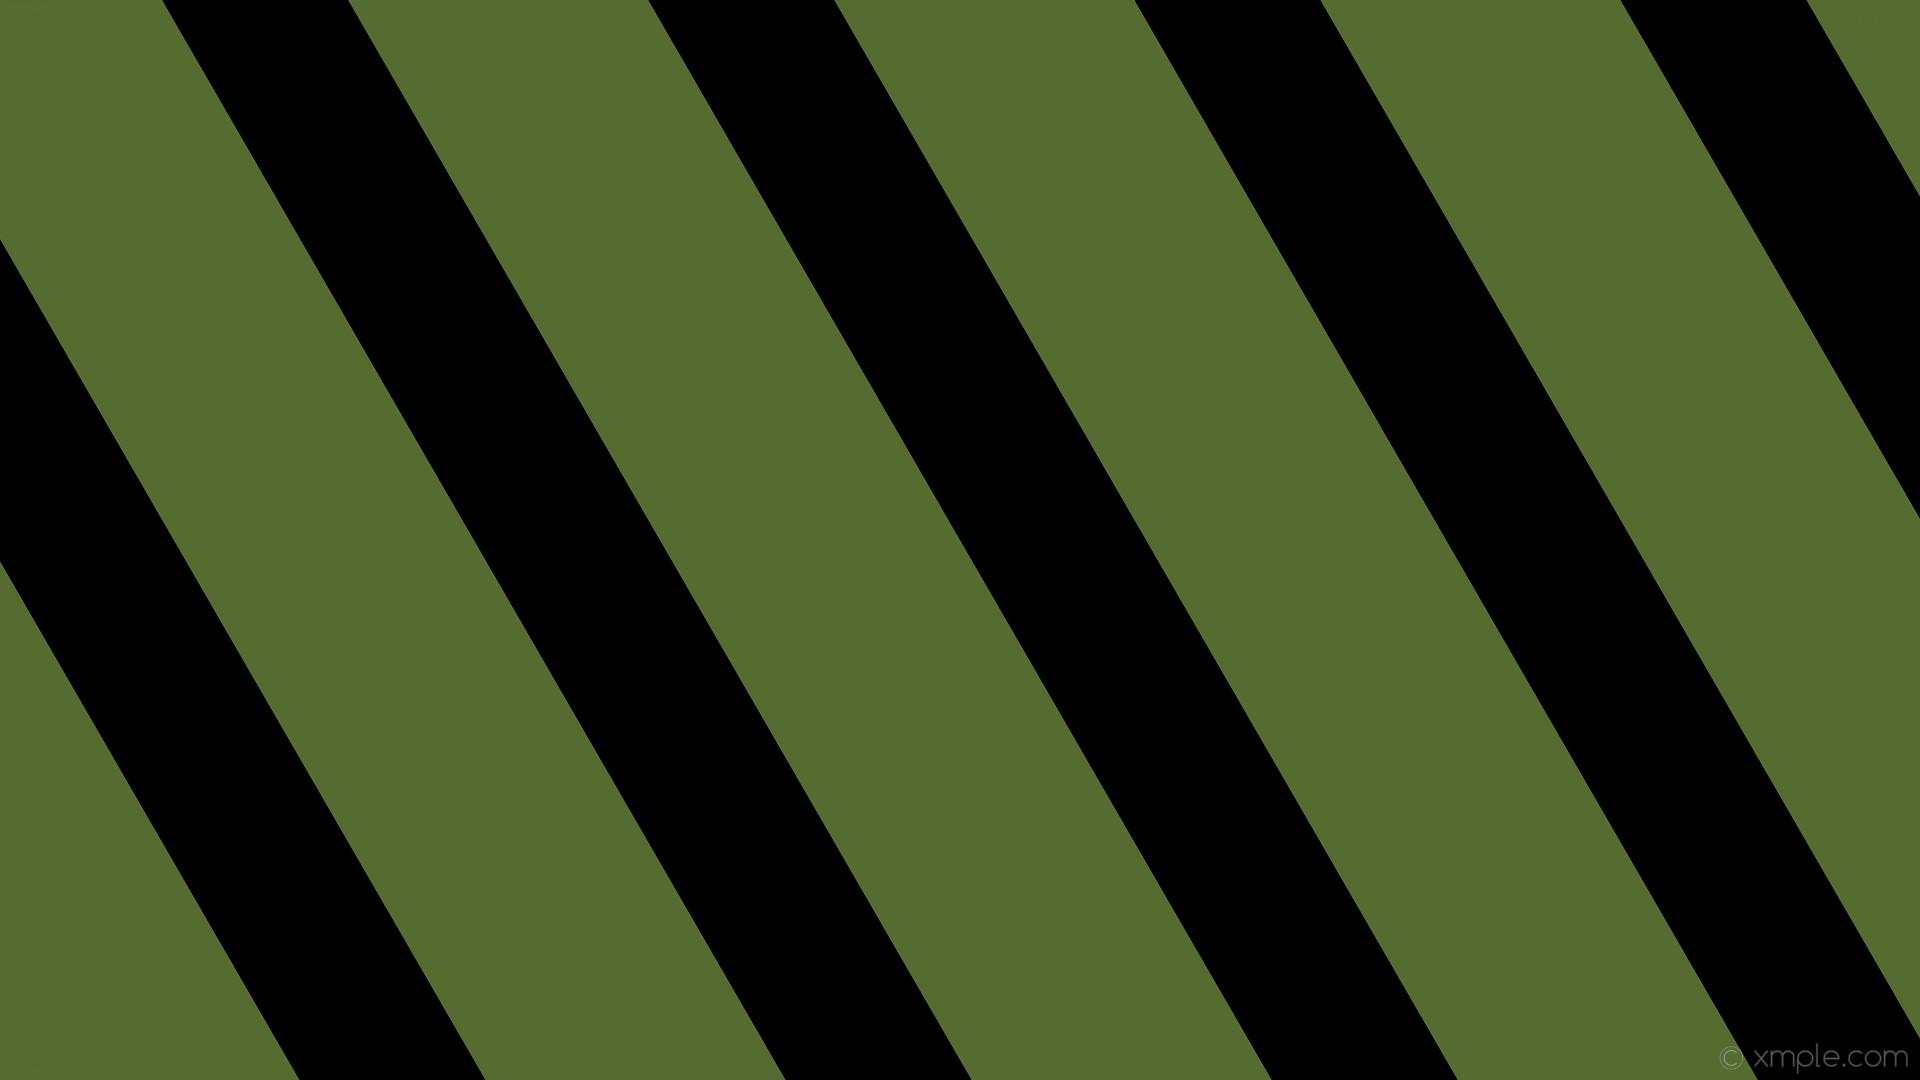 Res: 1920x1080, wallpaper green black streaks lines stripes dark olive green #000000  #556b2f diagonal 120°